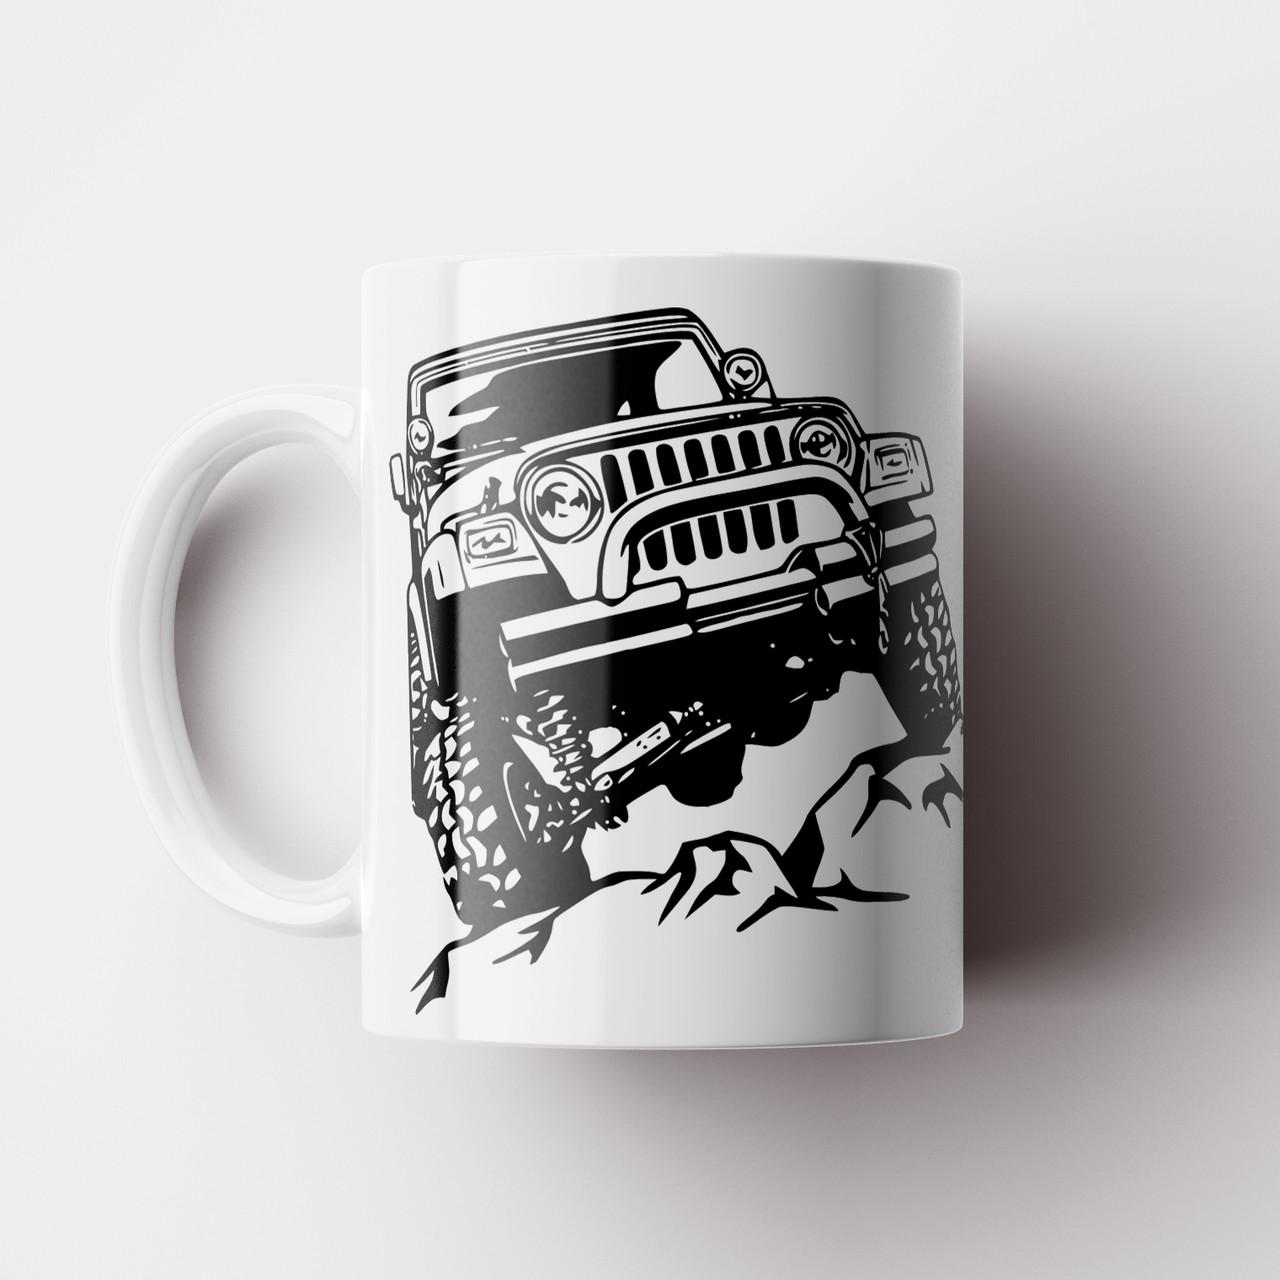 Чашка с принтом Jeep. Кружка с принтом Машина Джип. Чашка с фото